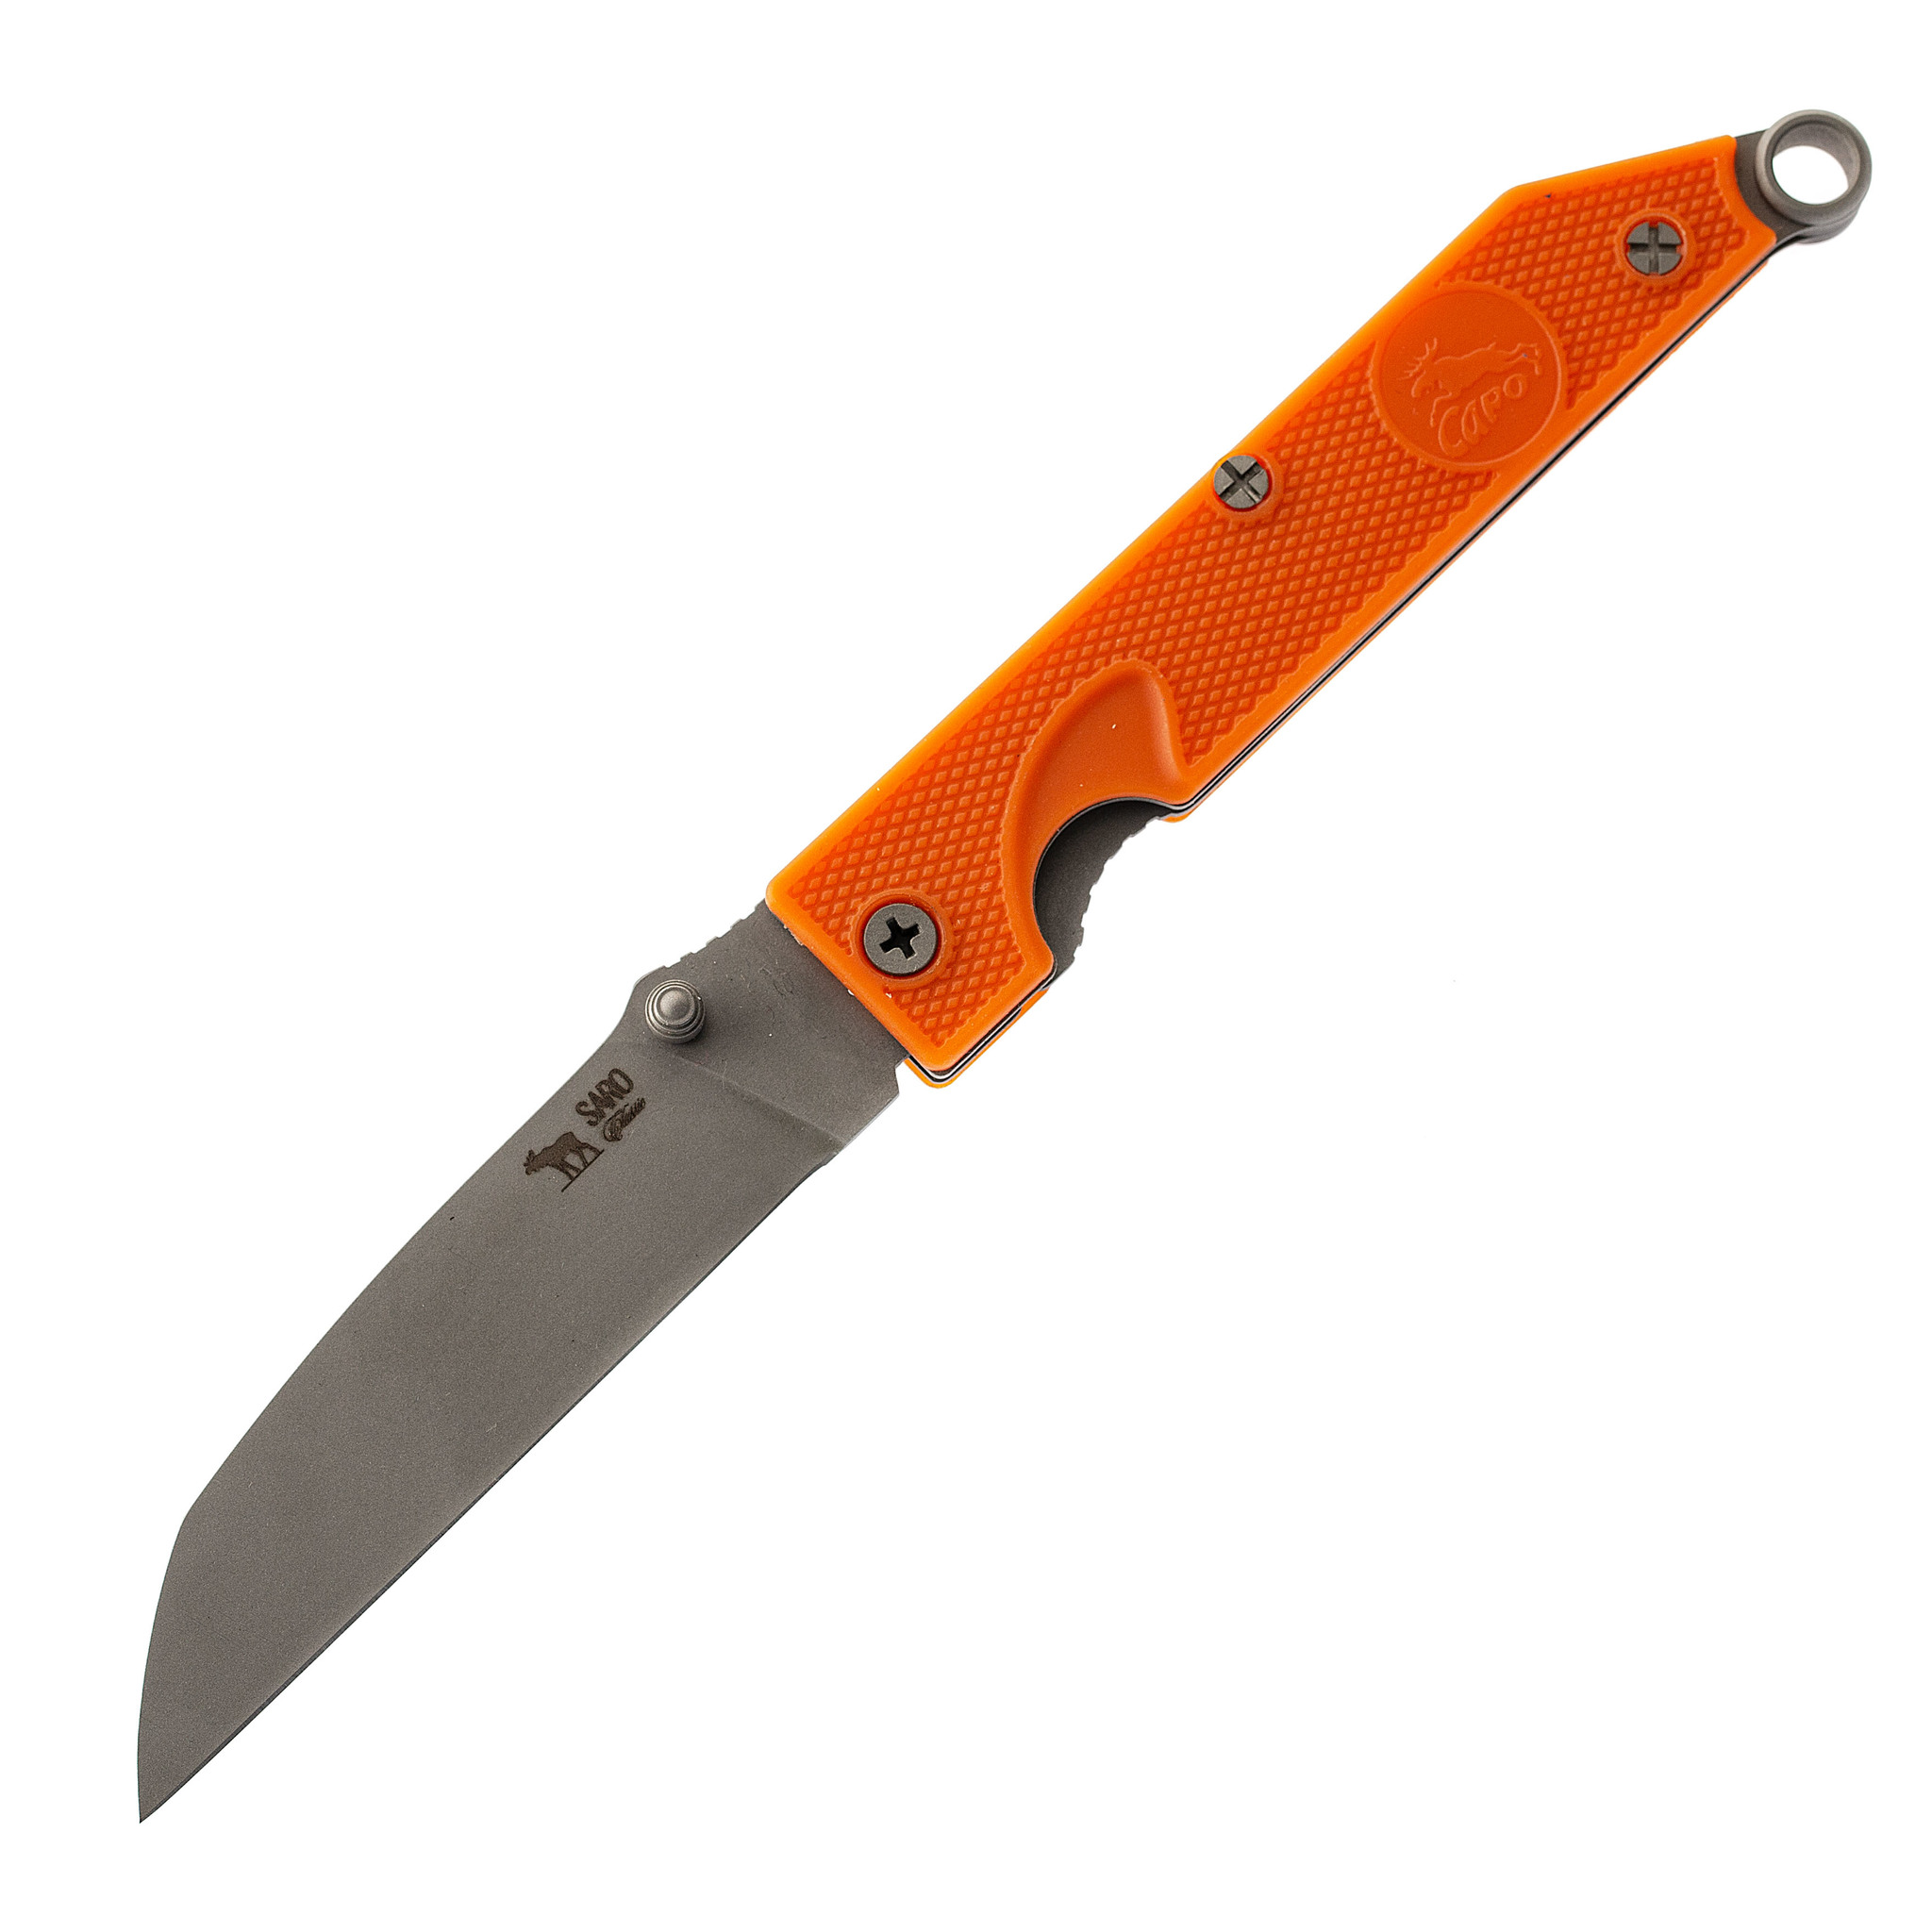 Складной нож Грибник, сталь AUS6, ABS-пластик от САРО